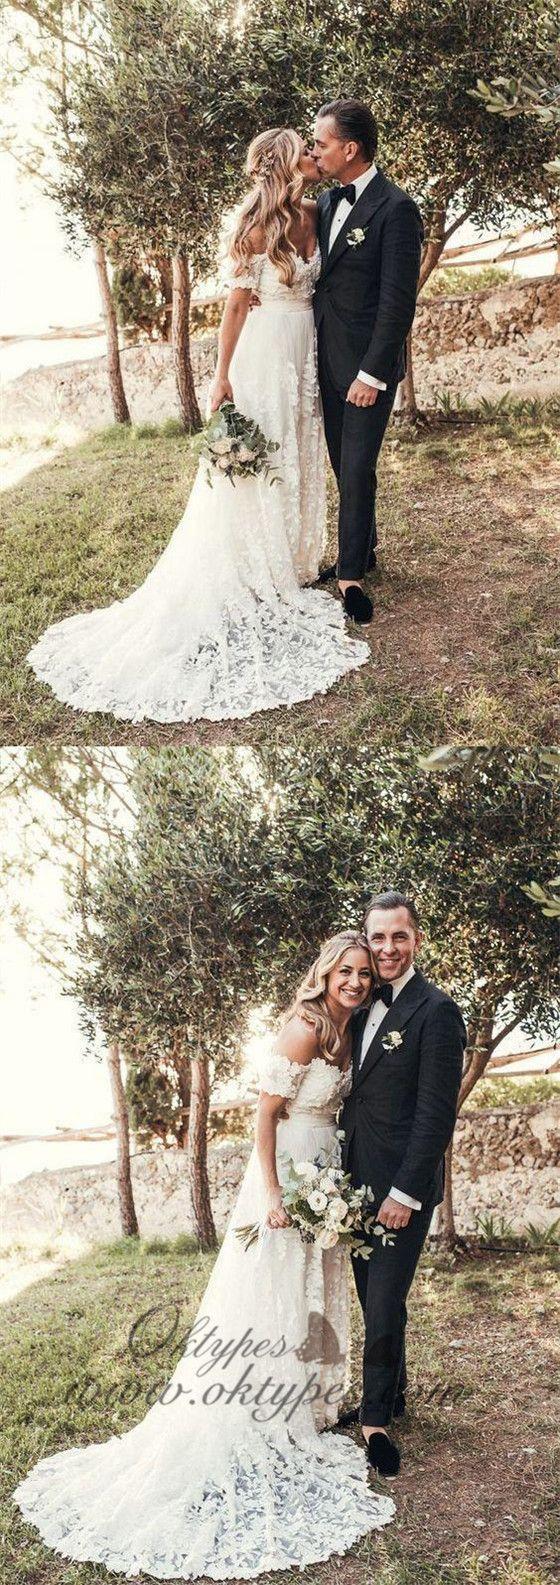 Ivory beach wedding dresses  Ivory Rustic Lace Wedding Dresses Off the Shoulder Beach Wedding